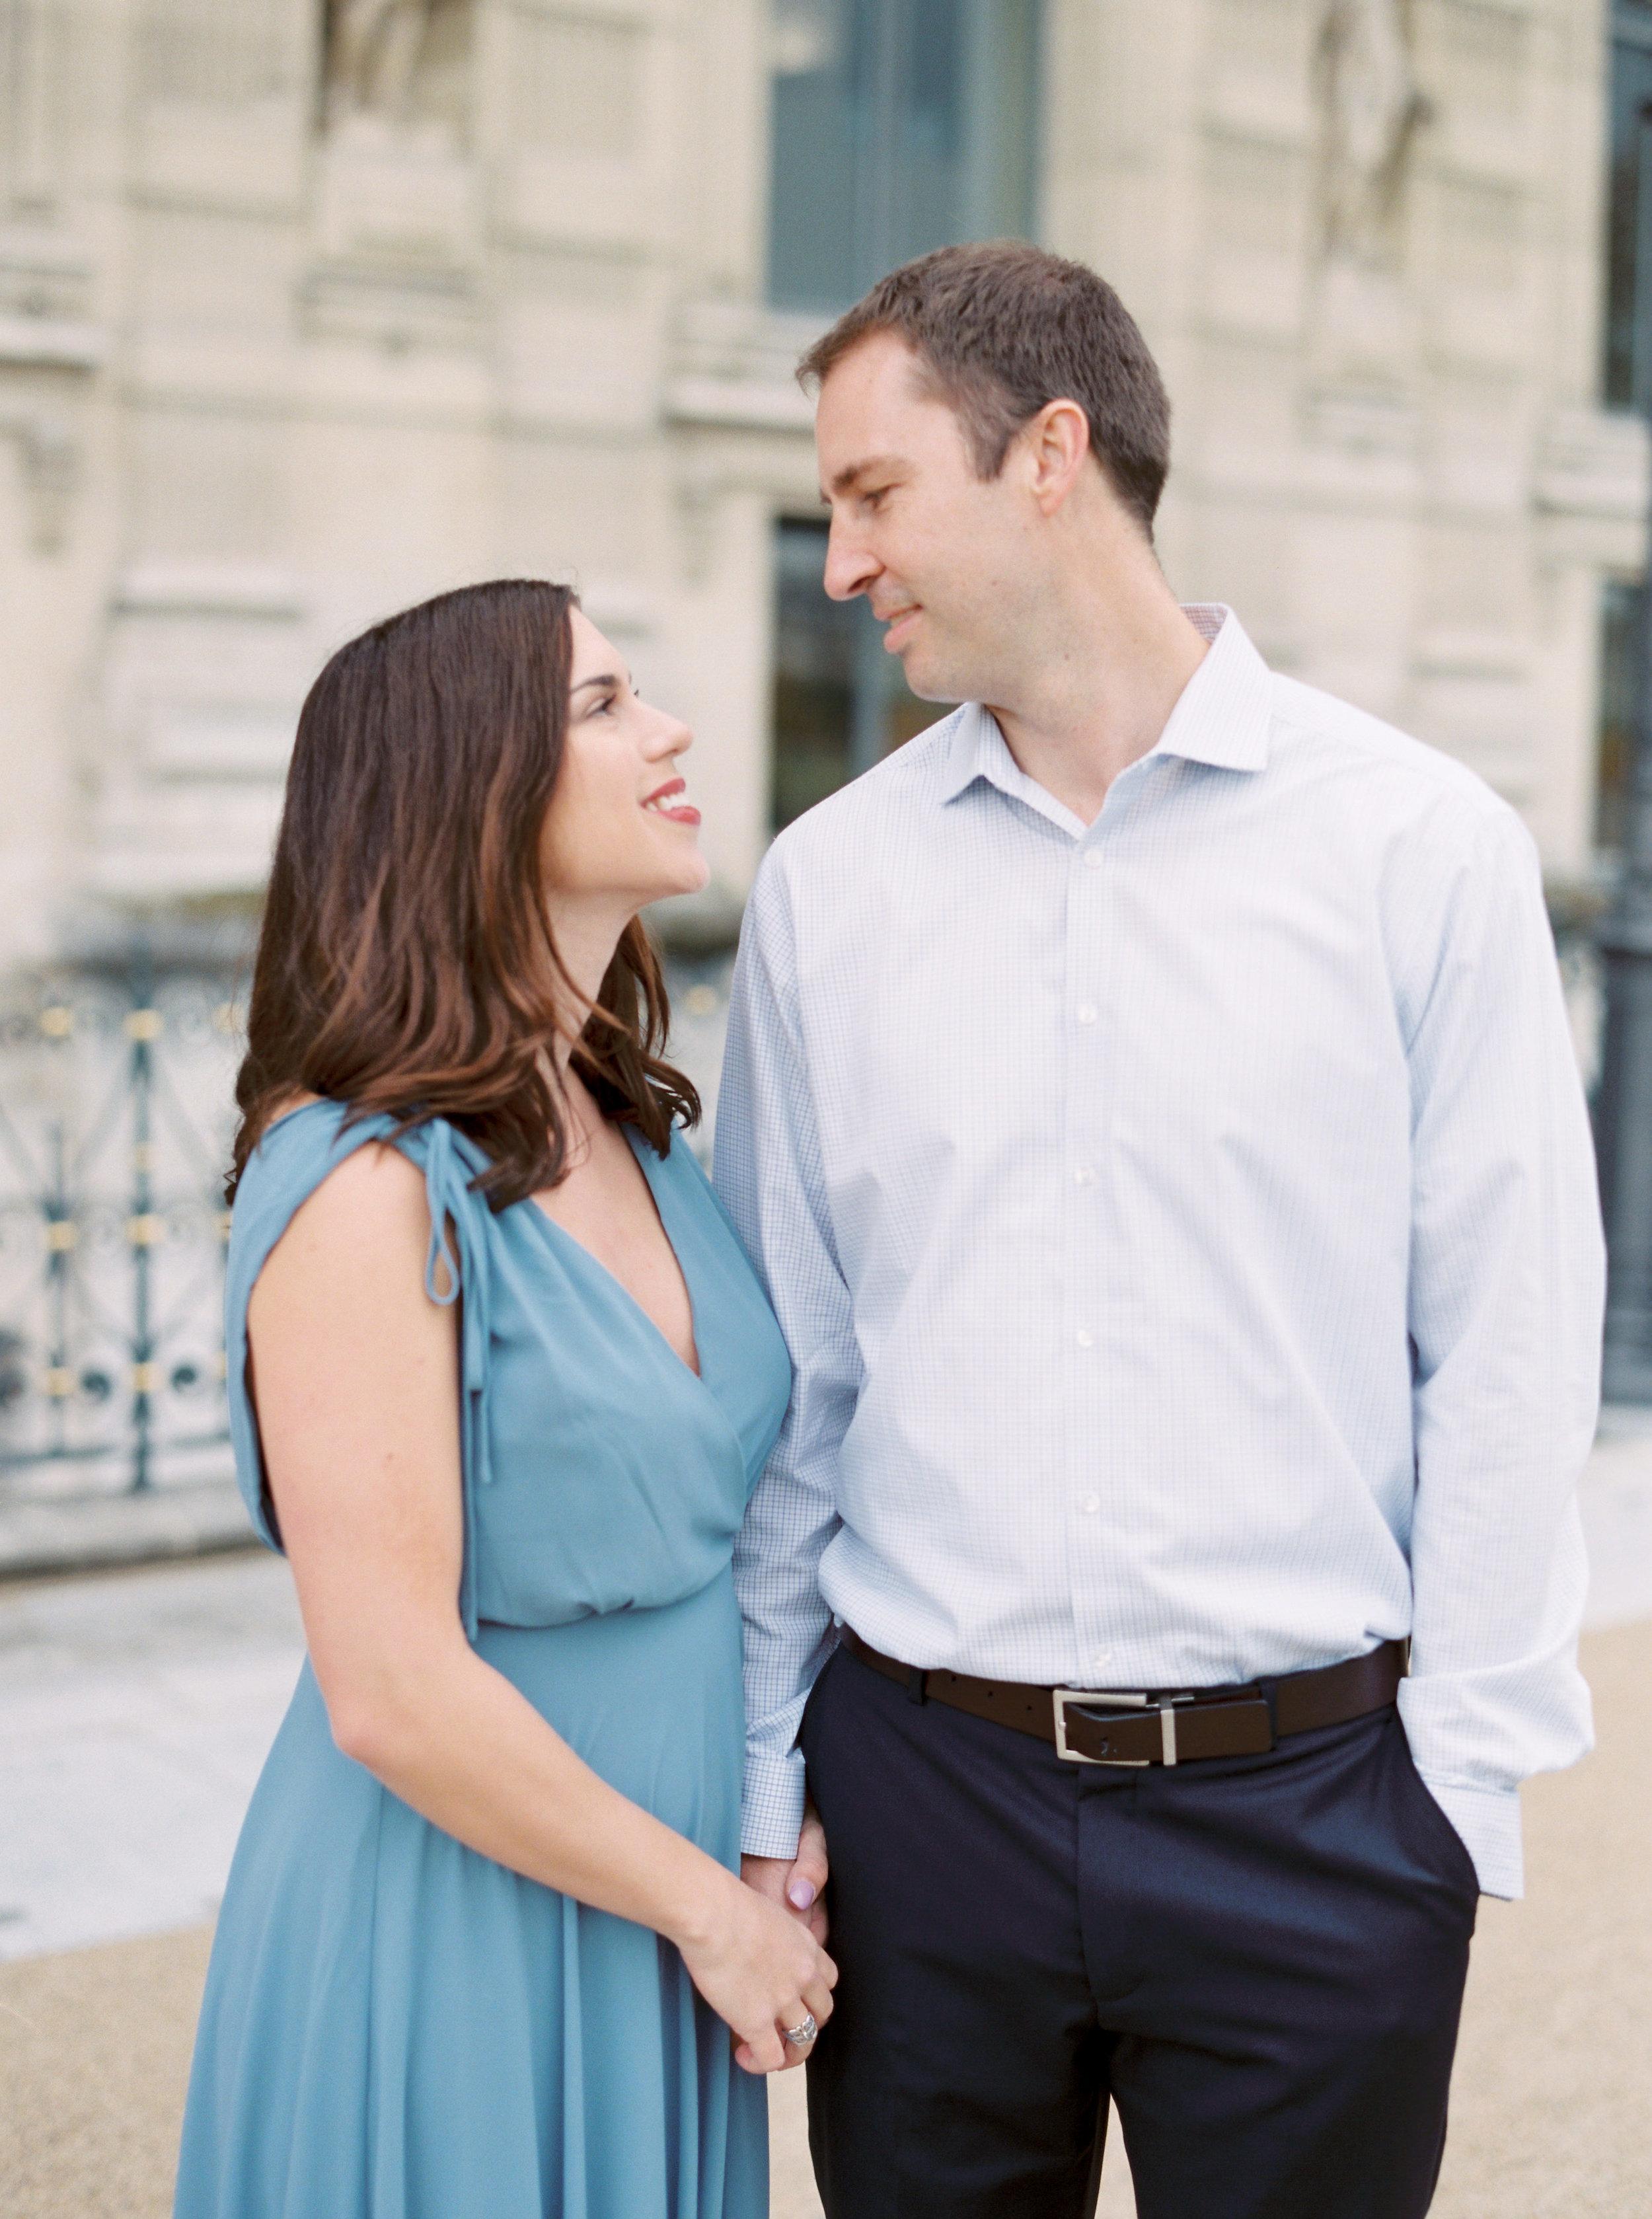 paris-france-wedding-photographer-destination-photographer-102.jpg